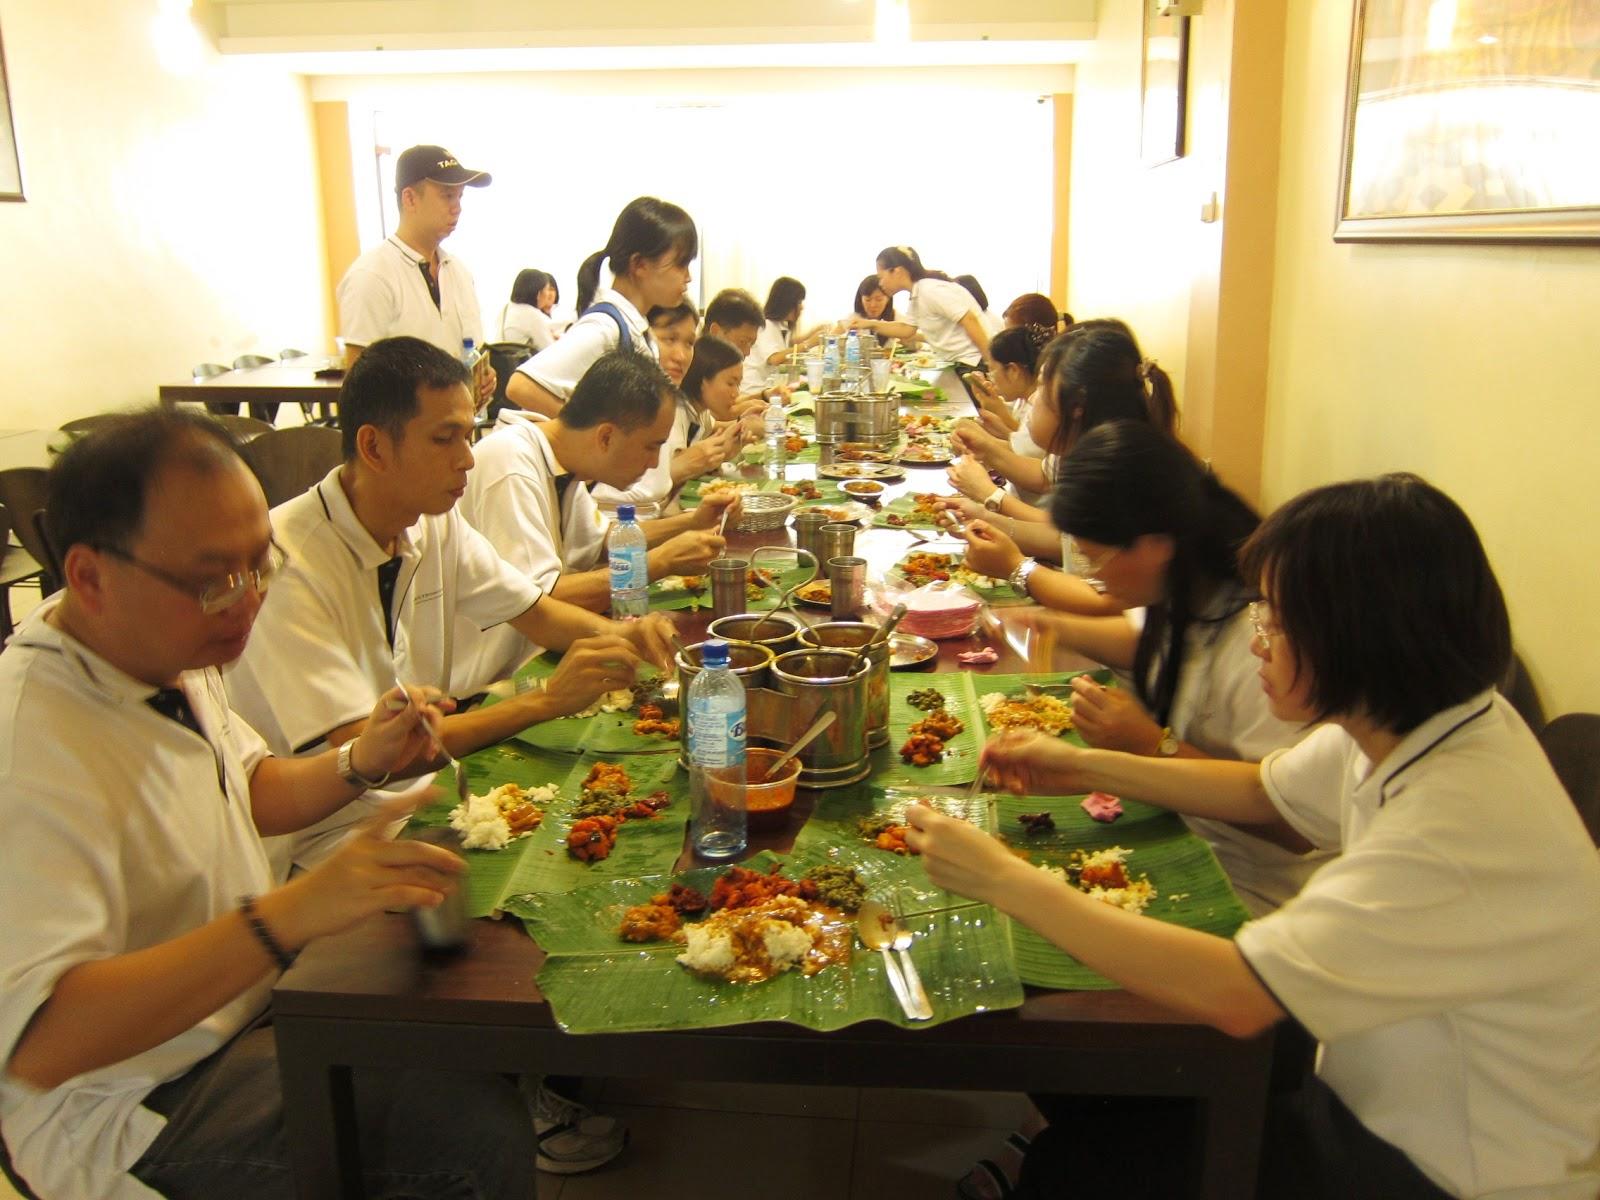 Ah seng blog team building 2 indian banana leaf cuisine for Team building cuisine